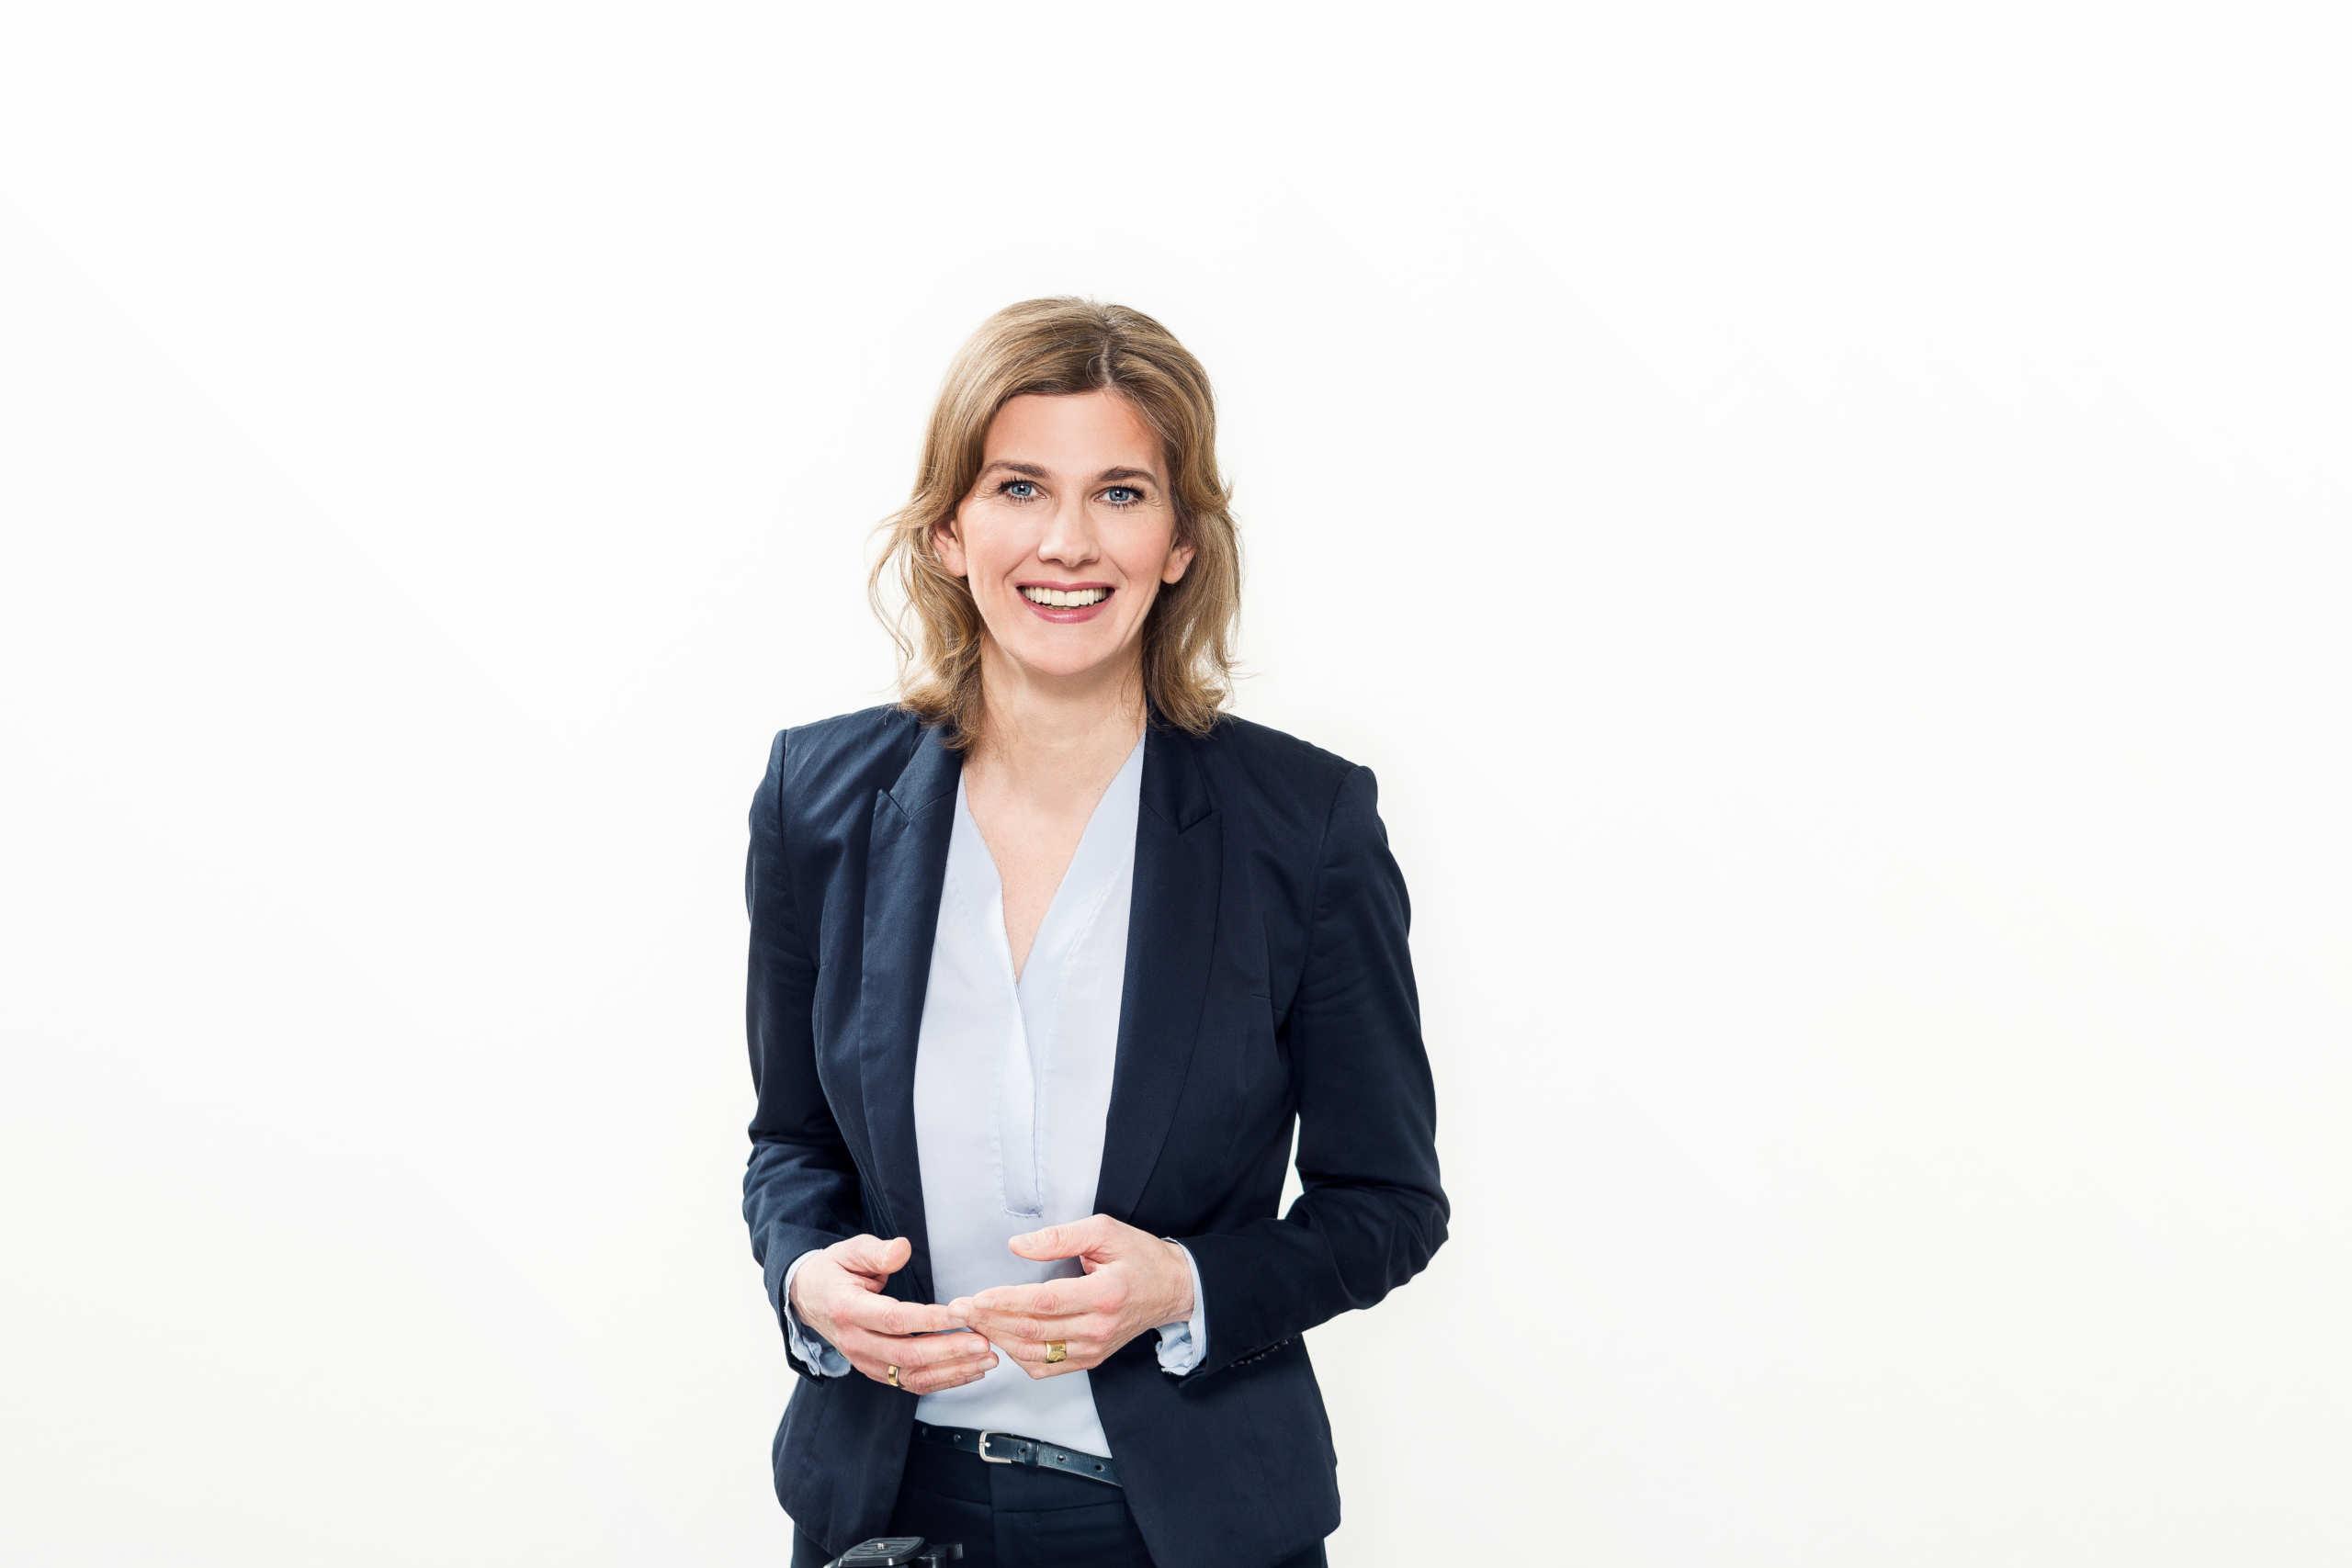 Nicole-Krieger-Leiterin-Moderatorenschule-Baden-Württemberg-1